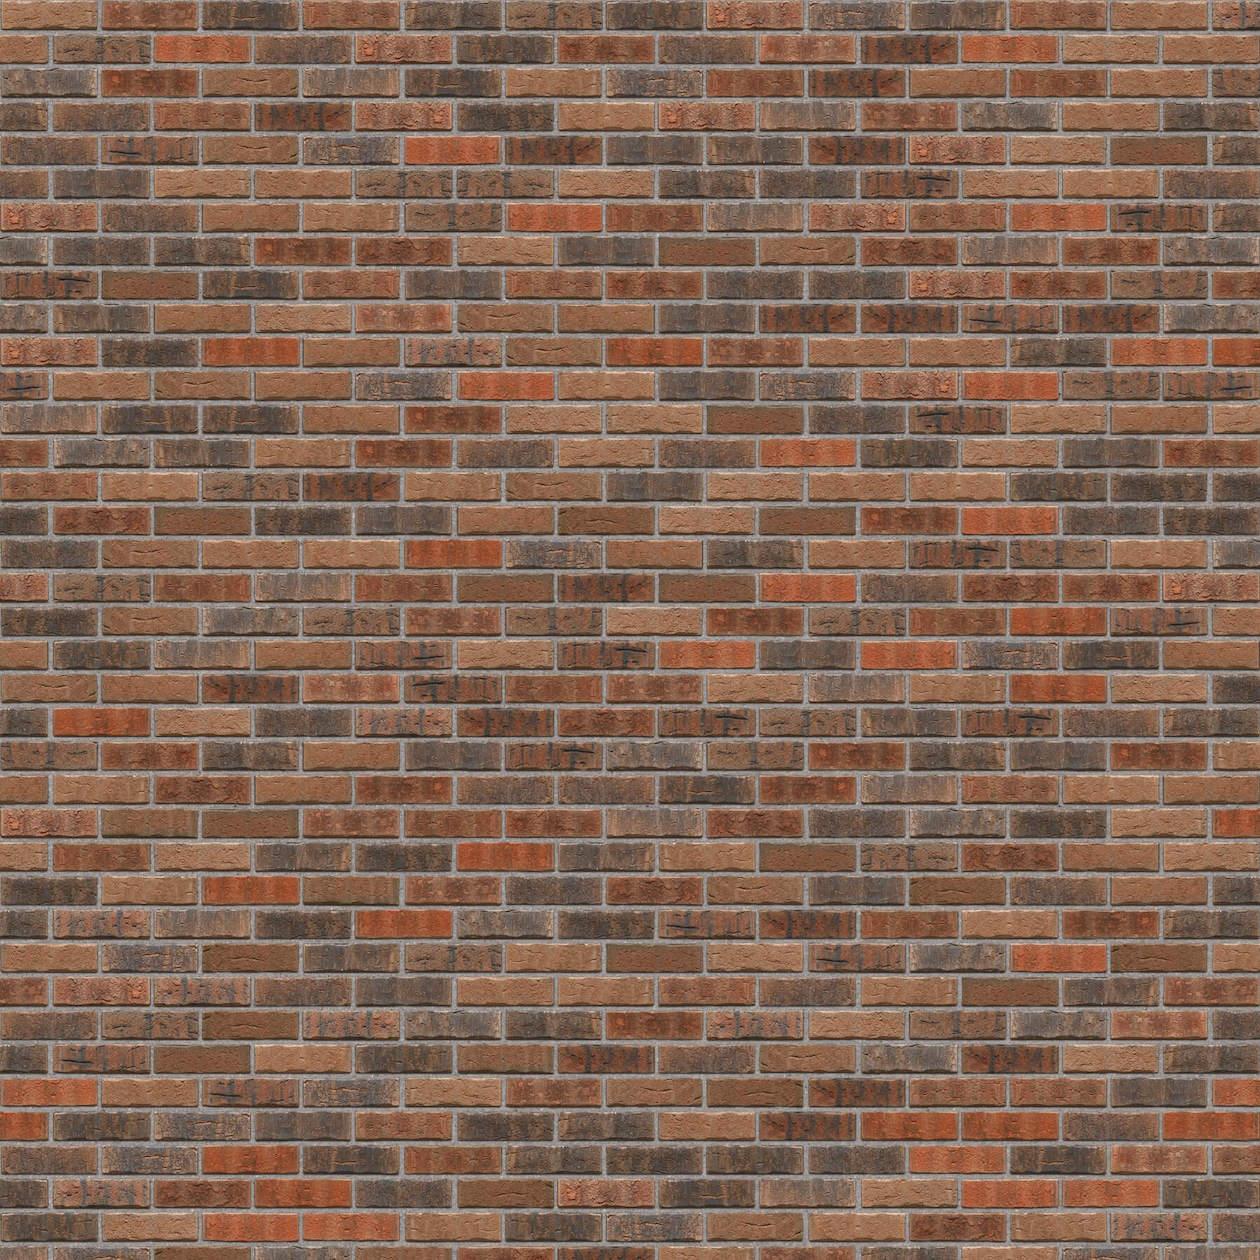 Puna-cigla-FeldHaus-Klinker-brick-house-nf-k-685-SIva Fuga